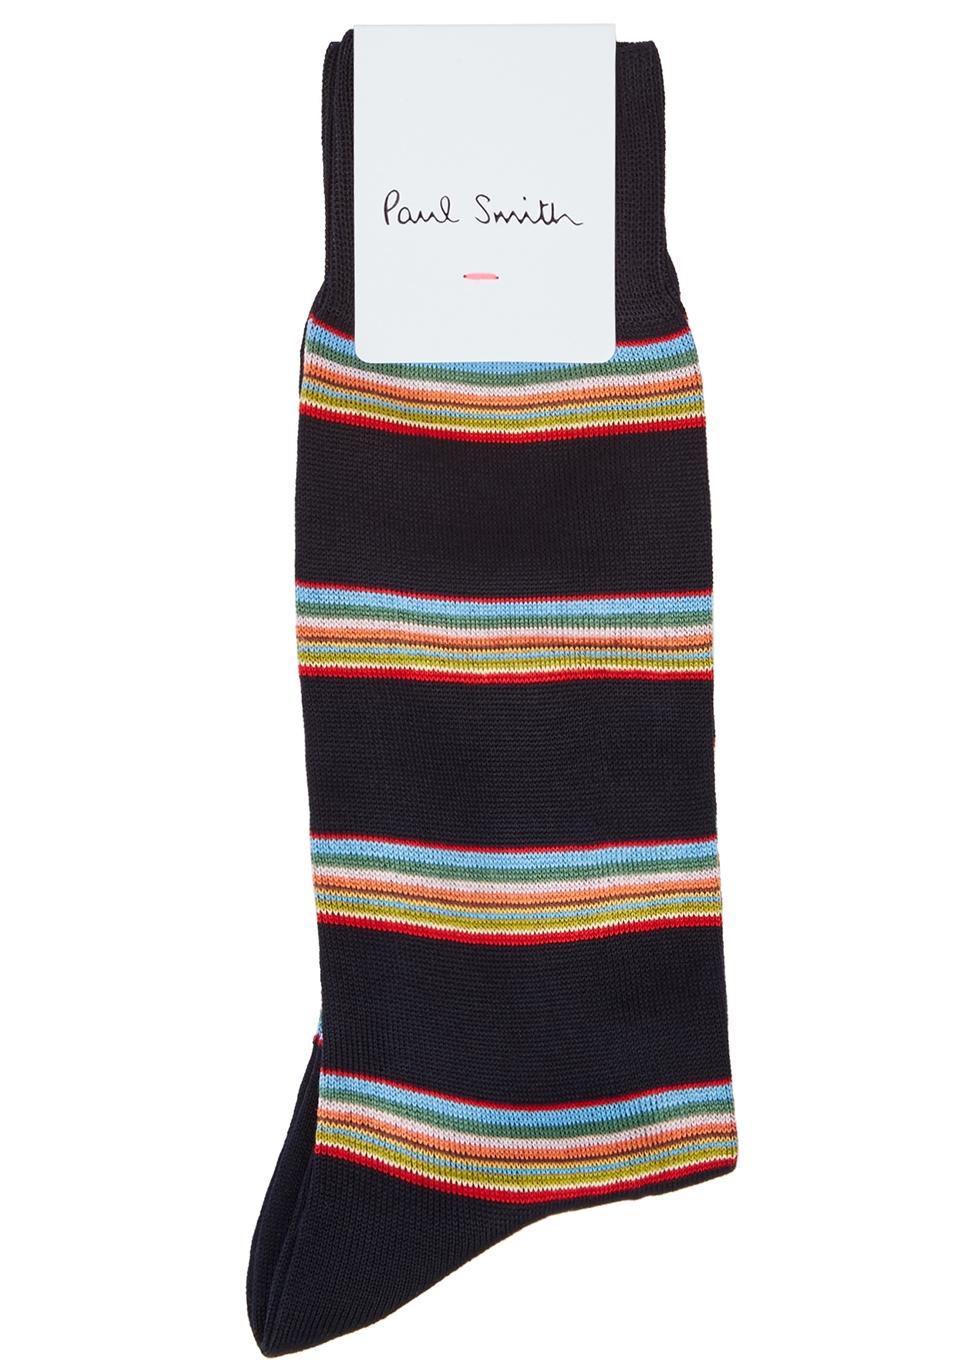 Navy striped cotton-blend socks - Paul Smith